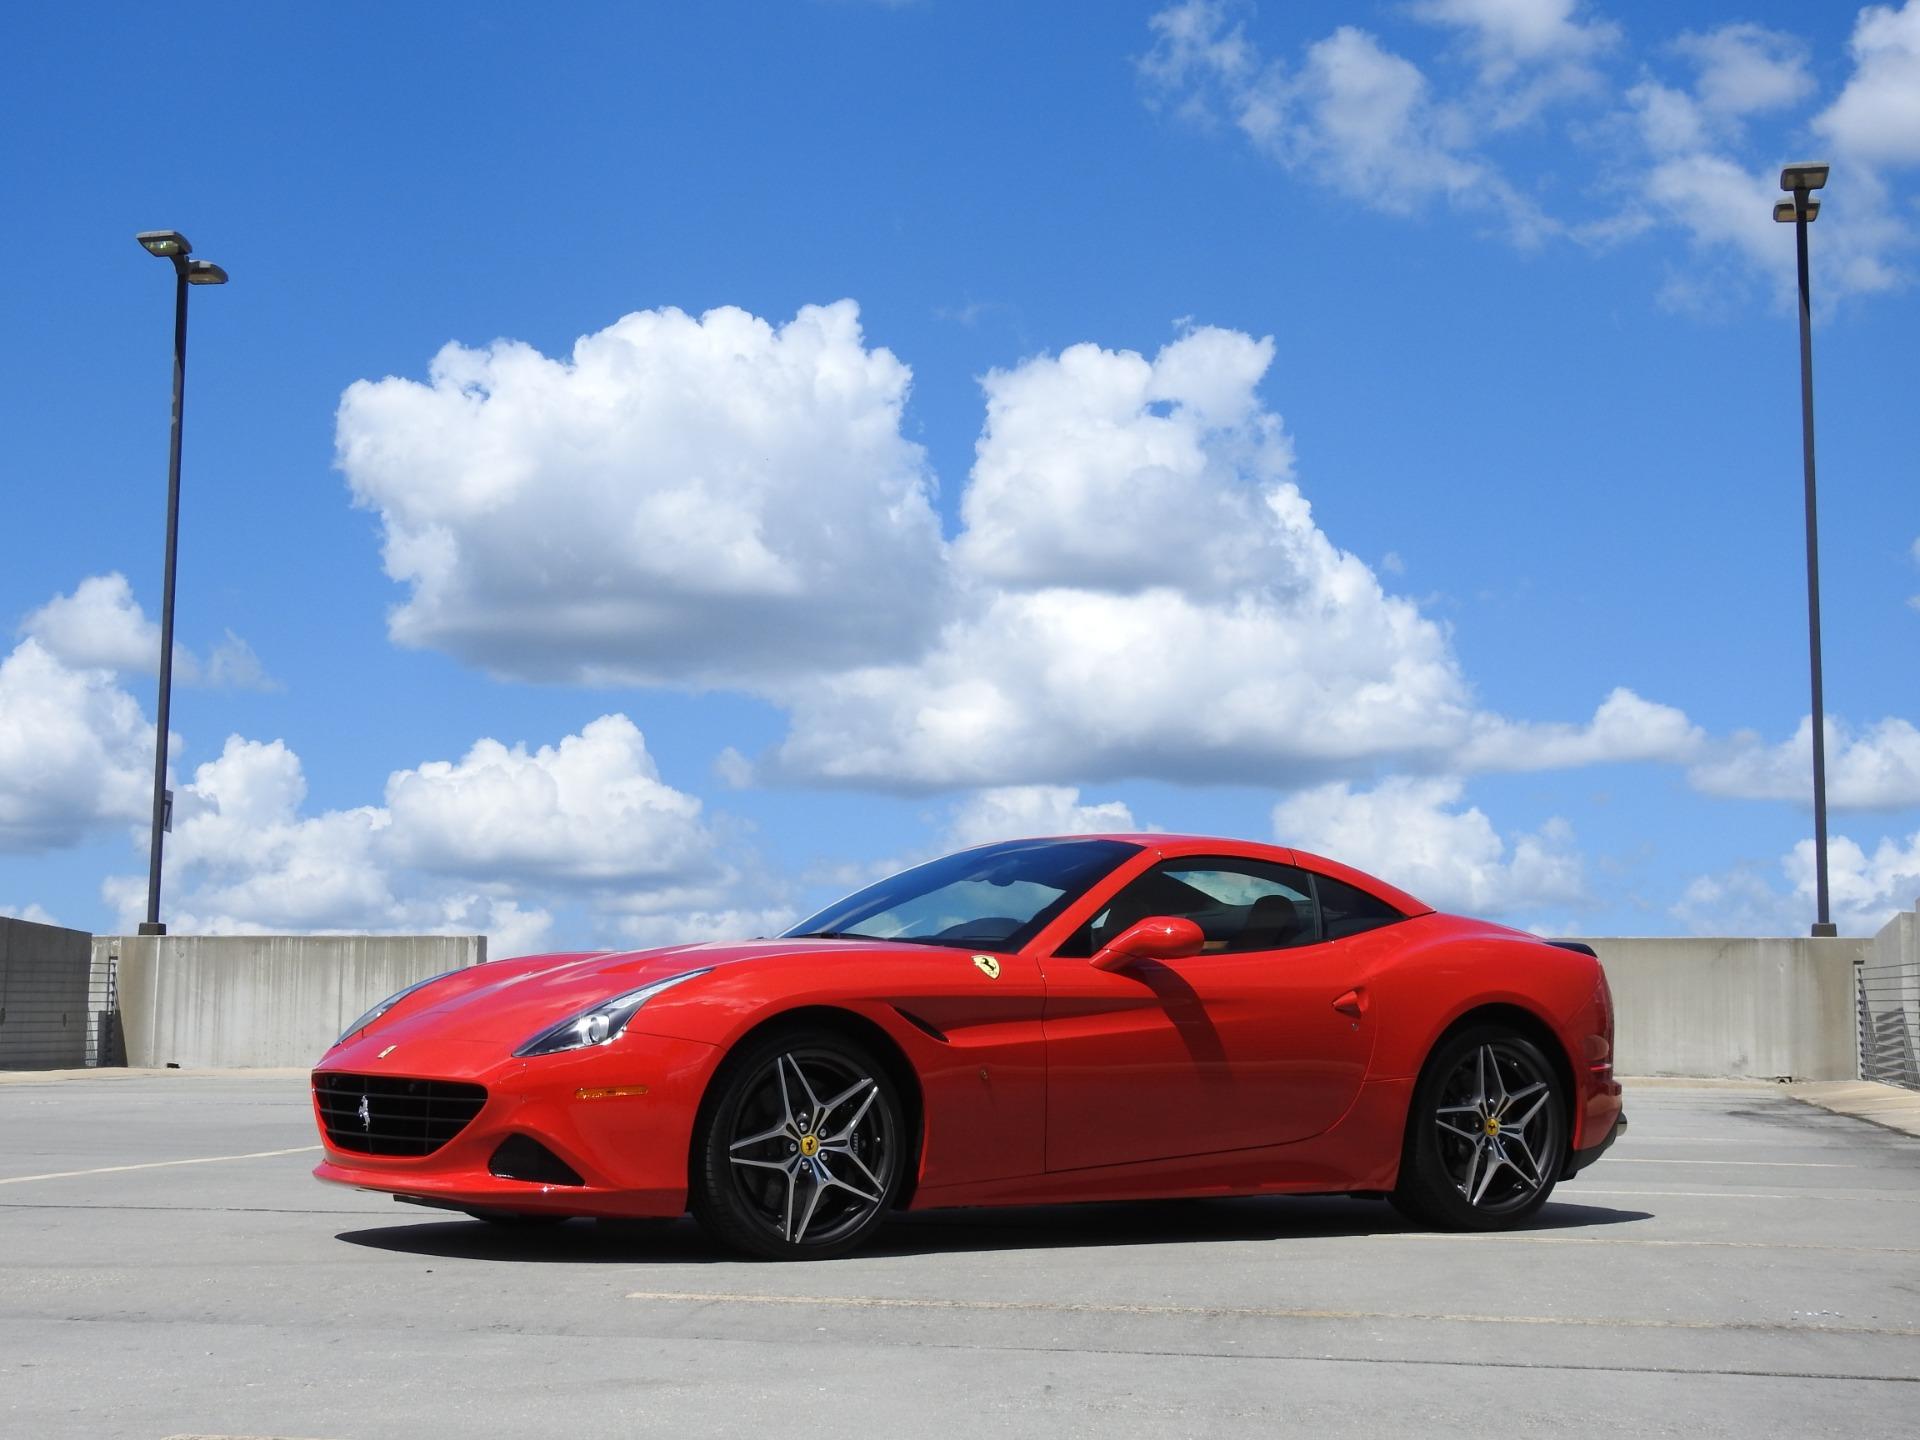 Used-2018-Ferrari-California-T-***-Only-131-Miles-***-Jackson-MS